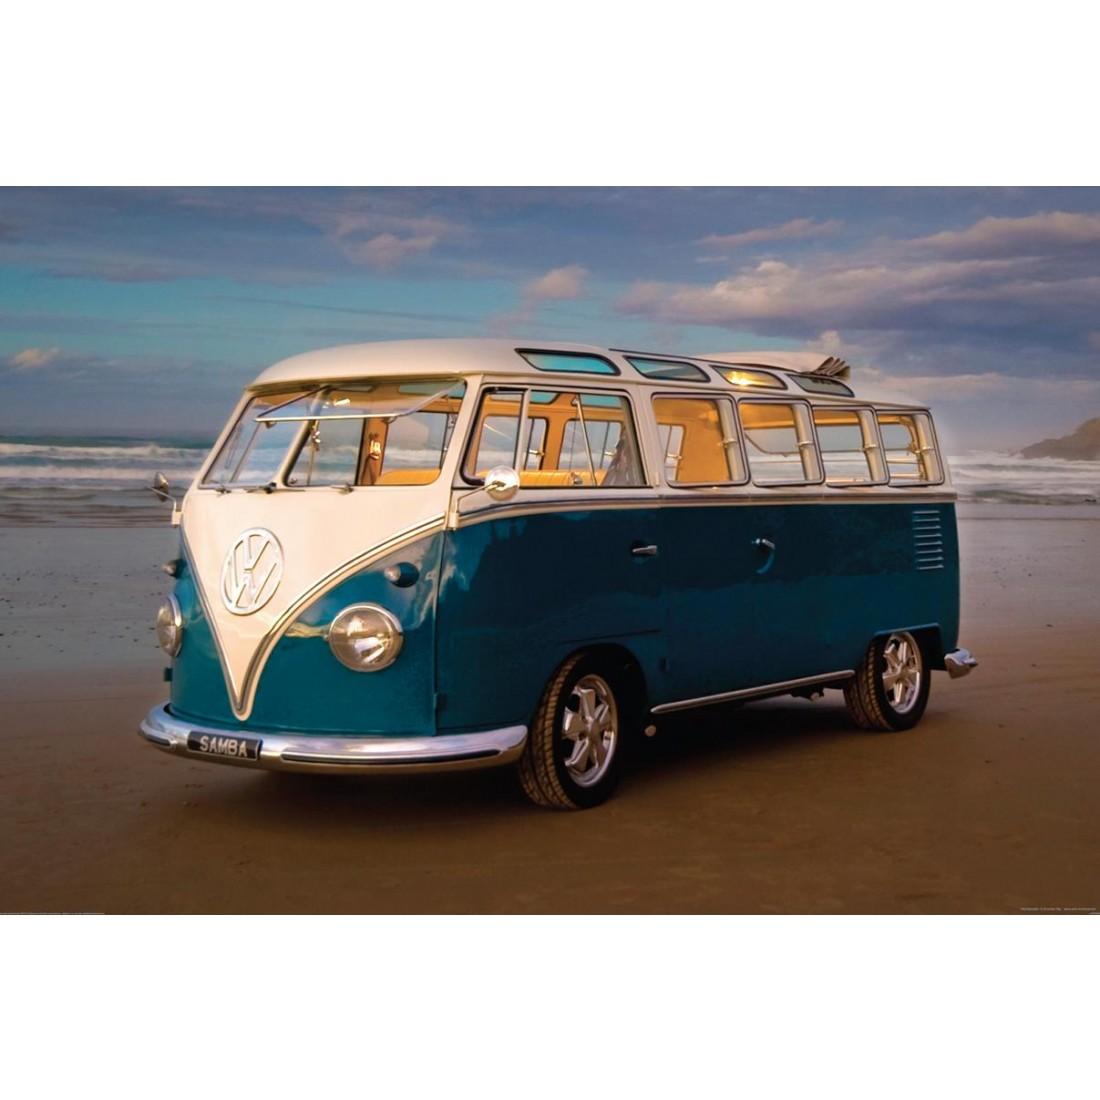 Volkswagen VW Campervan Wall Mural 158m x 232m 1Wall 1100x1100